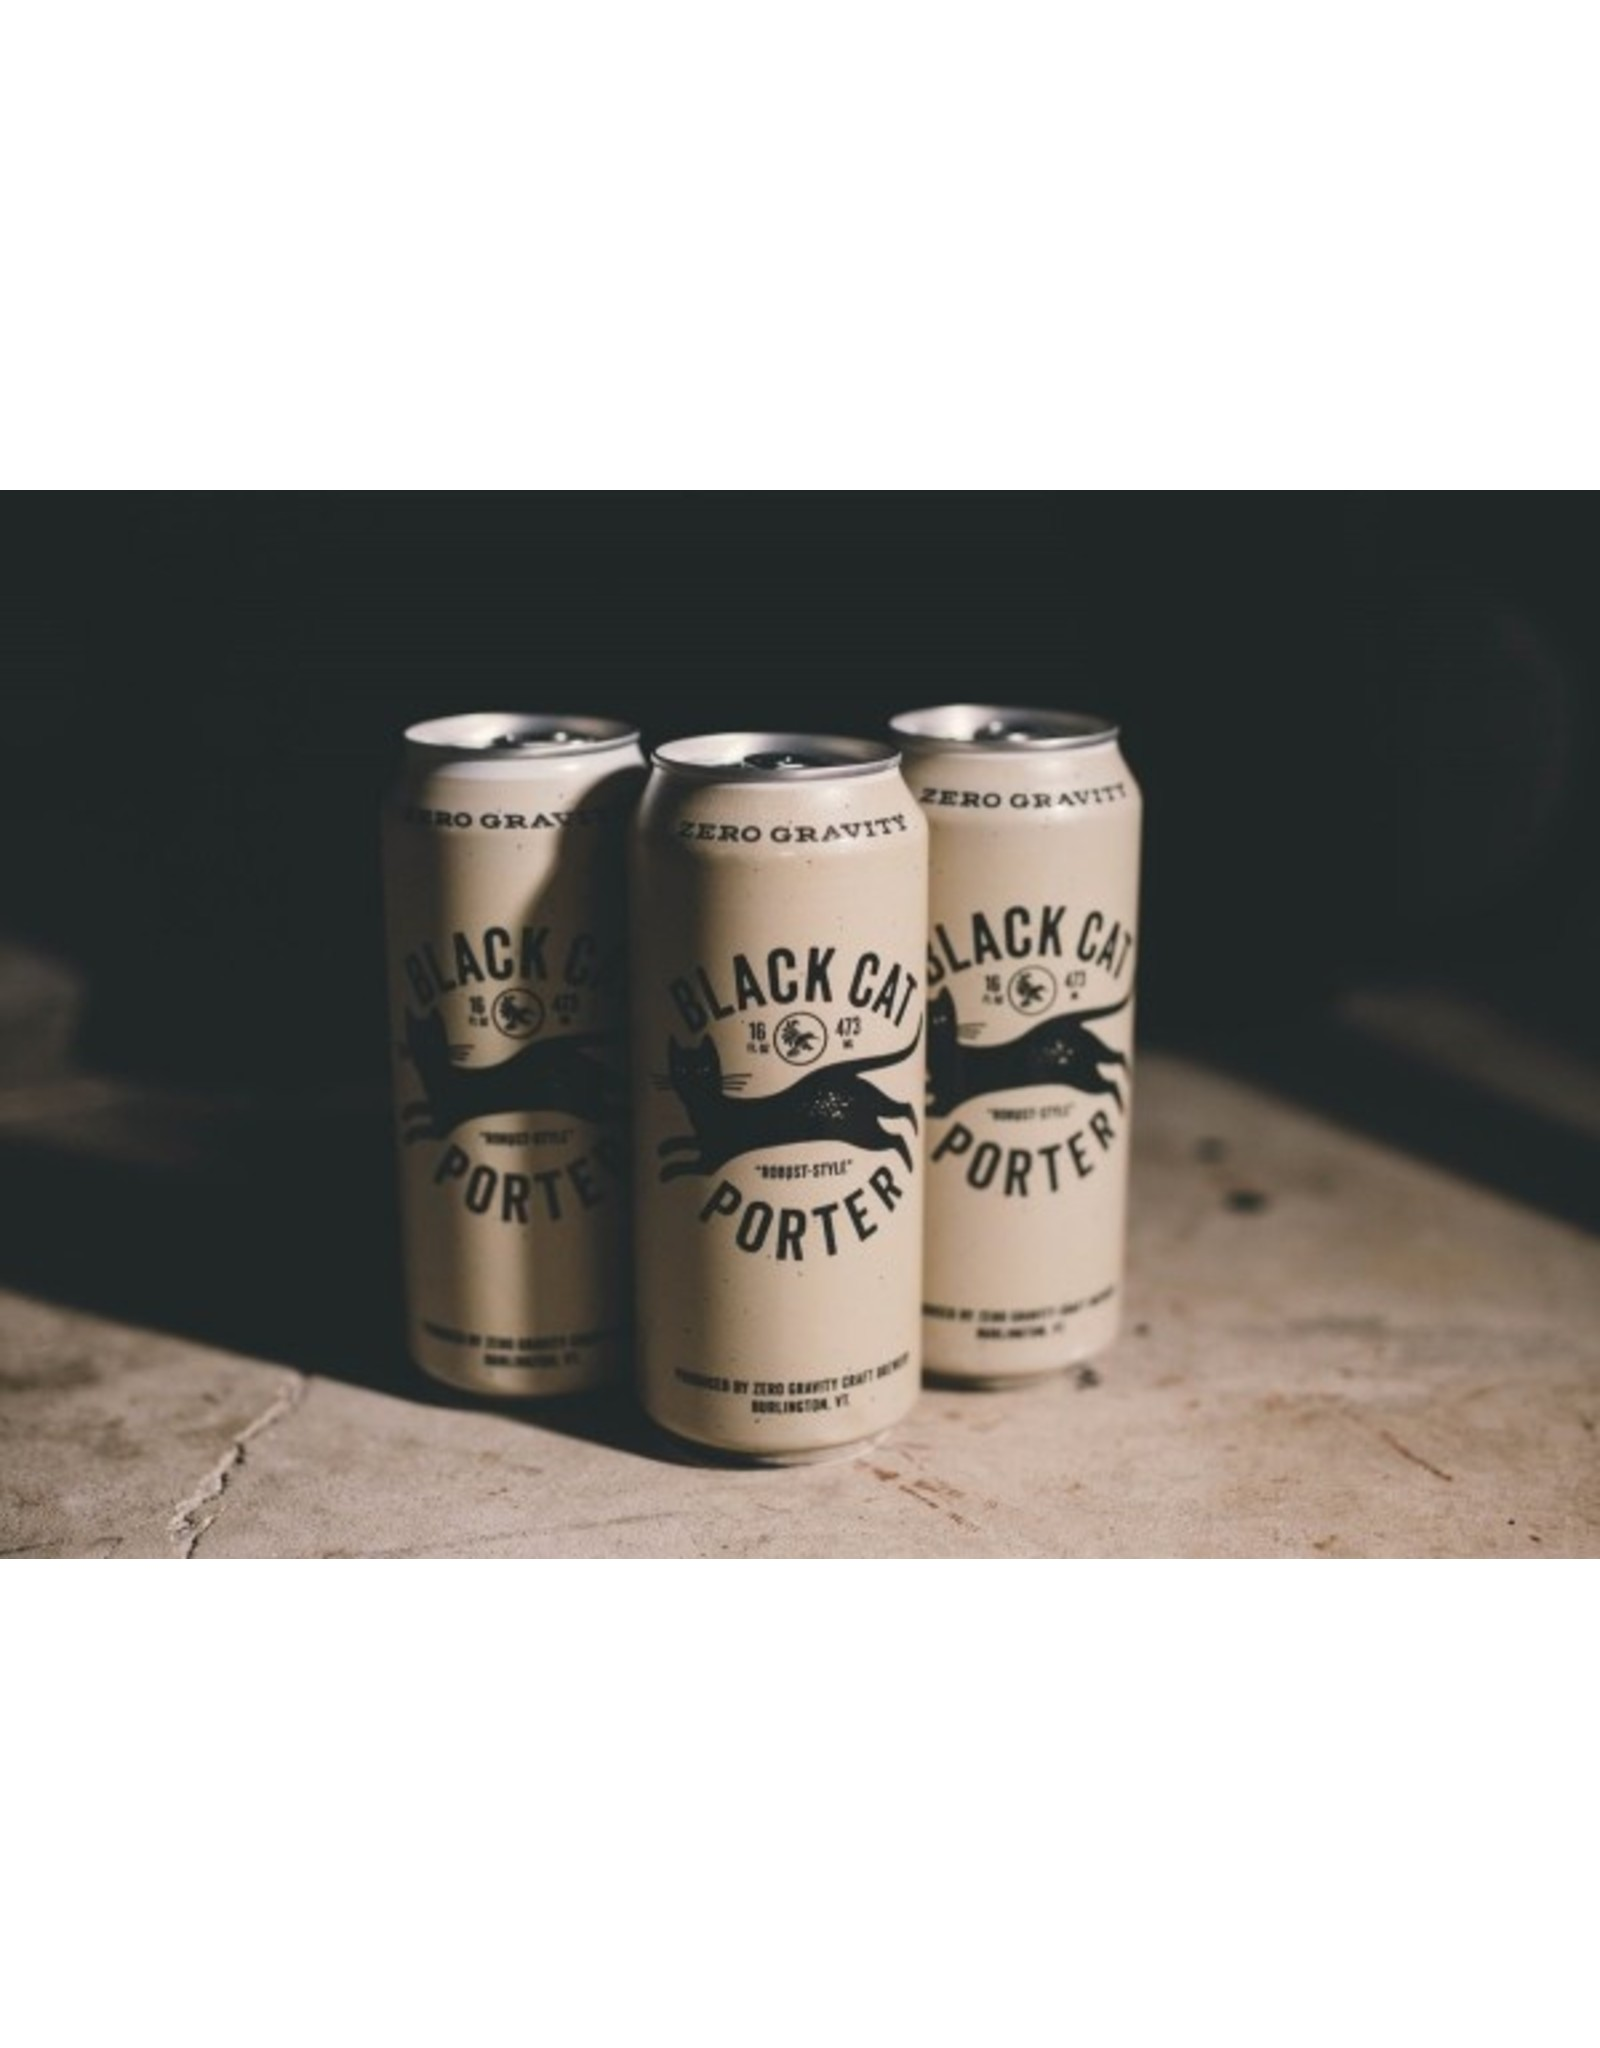 Zero Gravity Black Cat Porter 16oz 4pk Cans